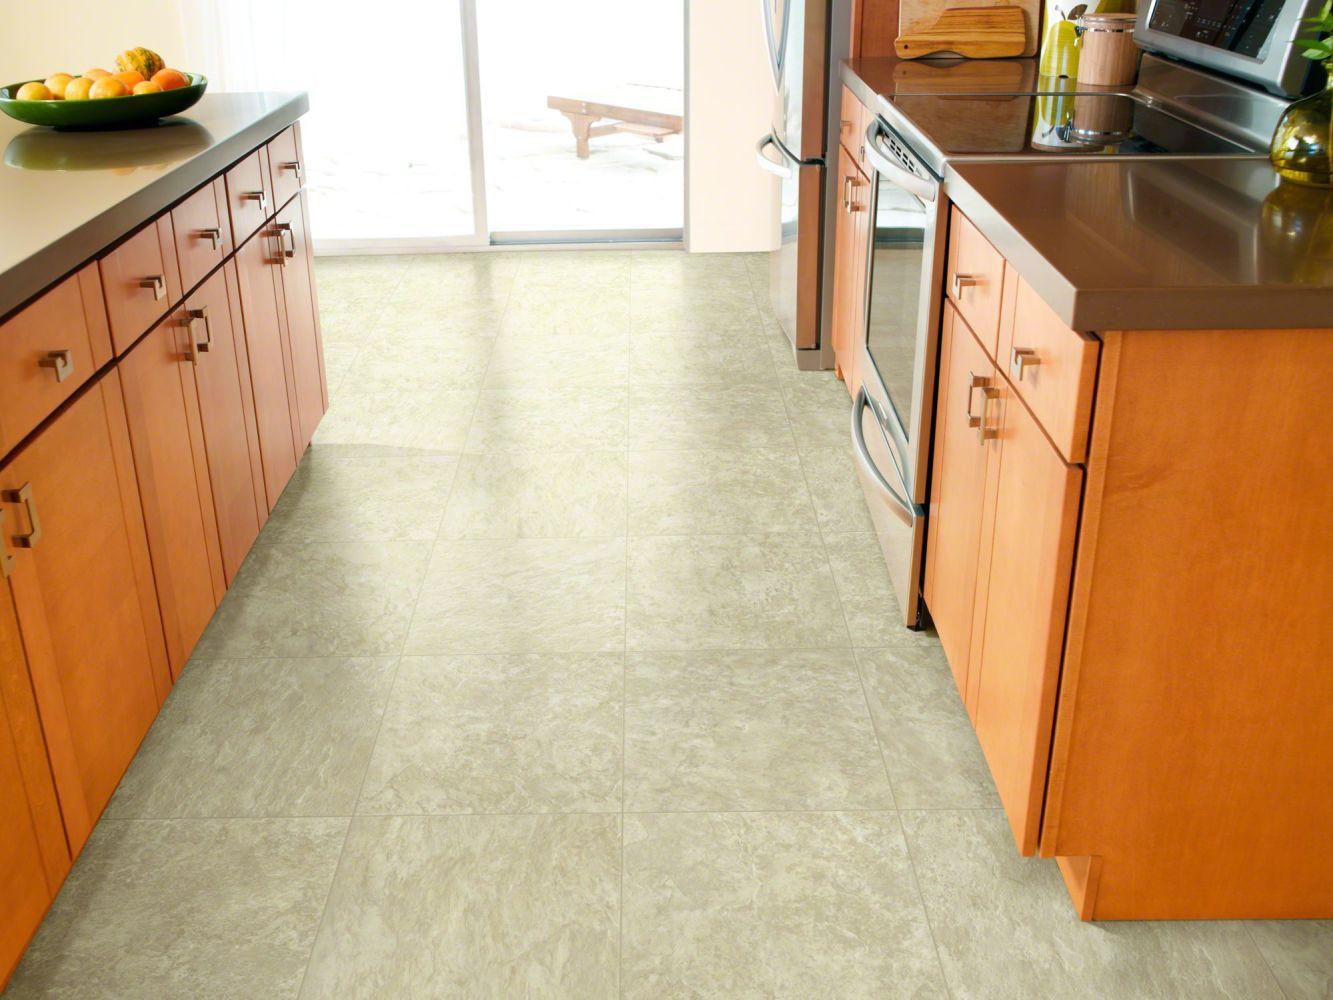 Shaw Floors Vinyl Residential Cascades 12c Olympia 00130_0610V